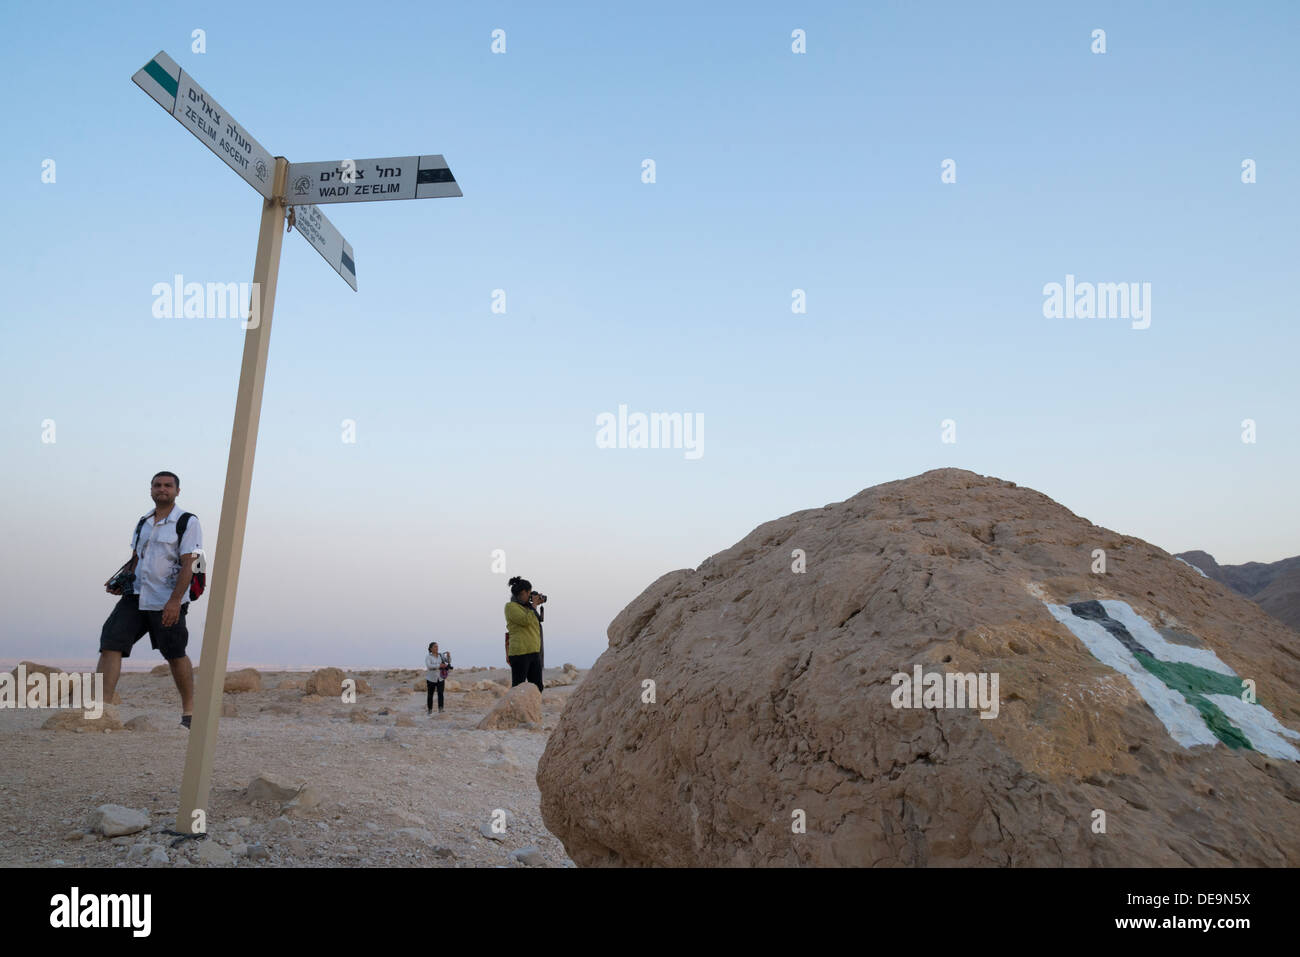 Trek dans le Wadi Zeelim. Désert de Judée. Israël. Photo Stock